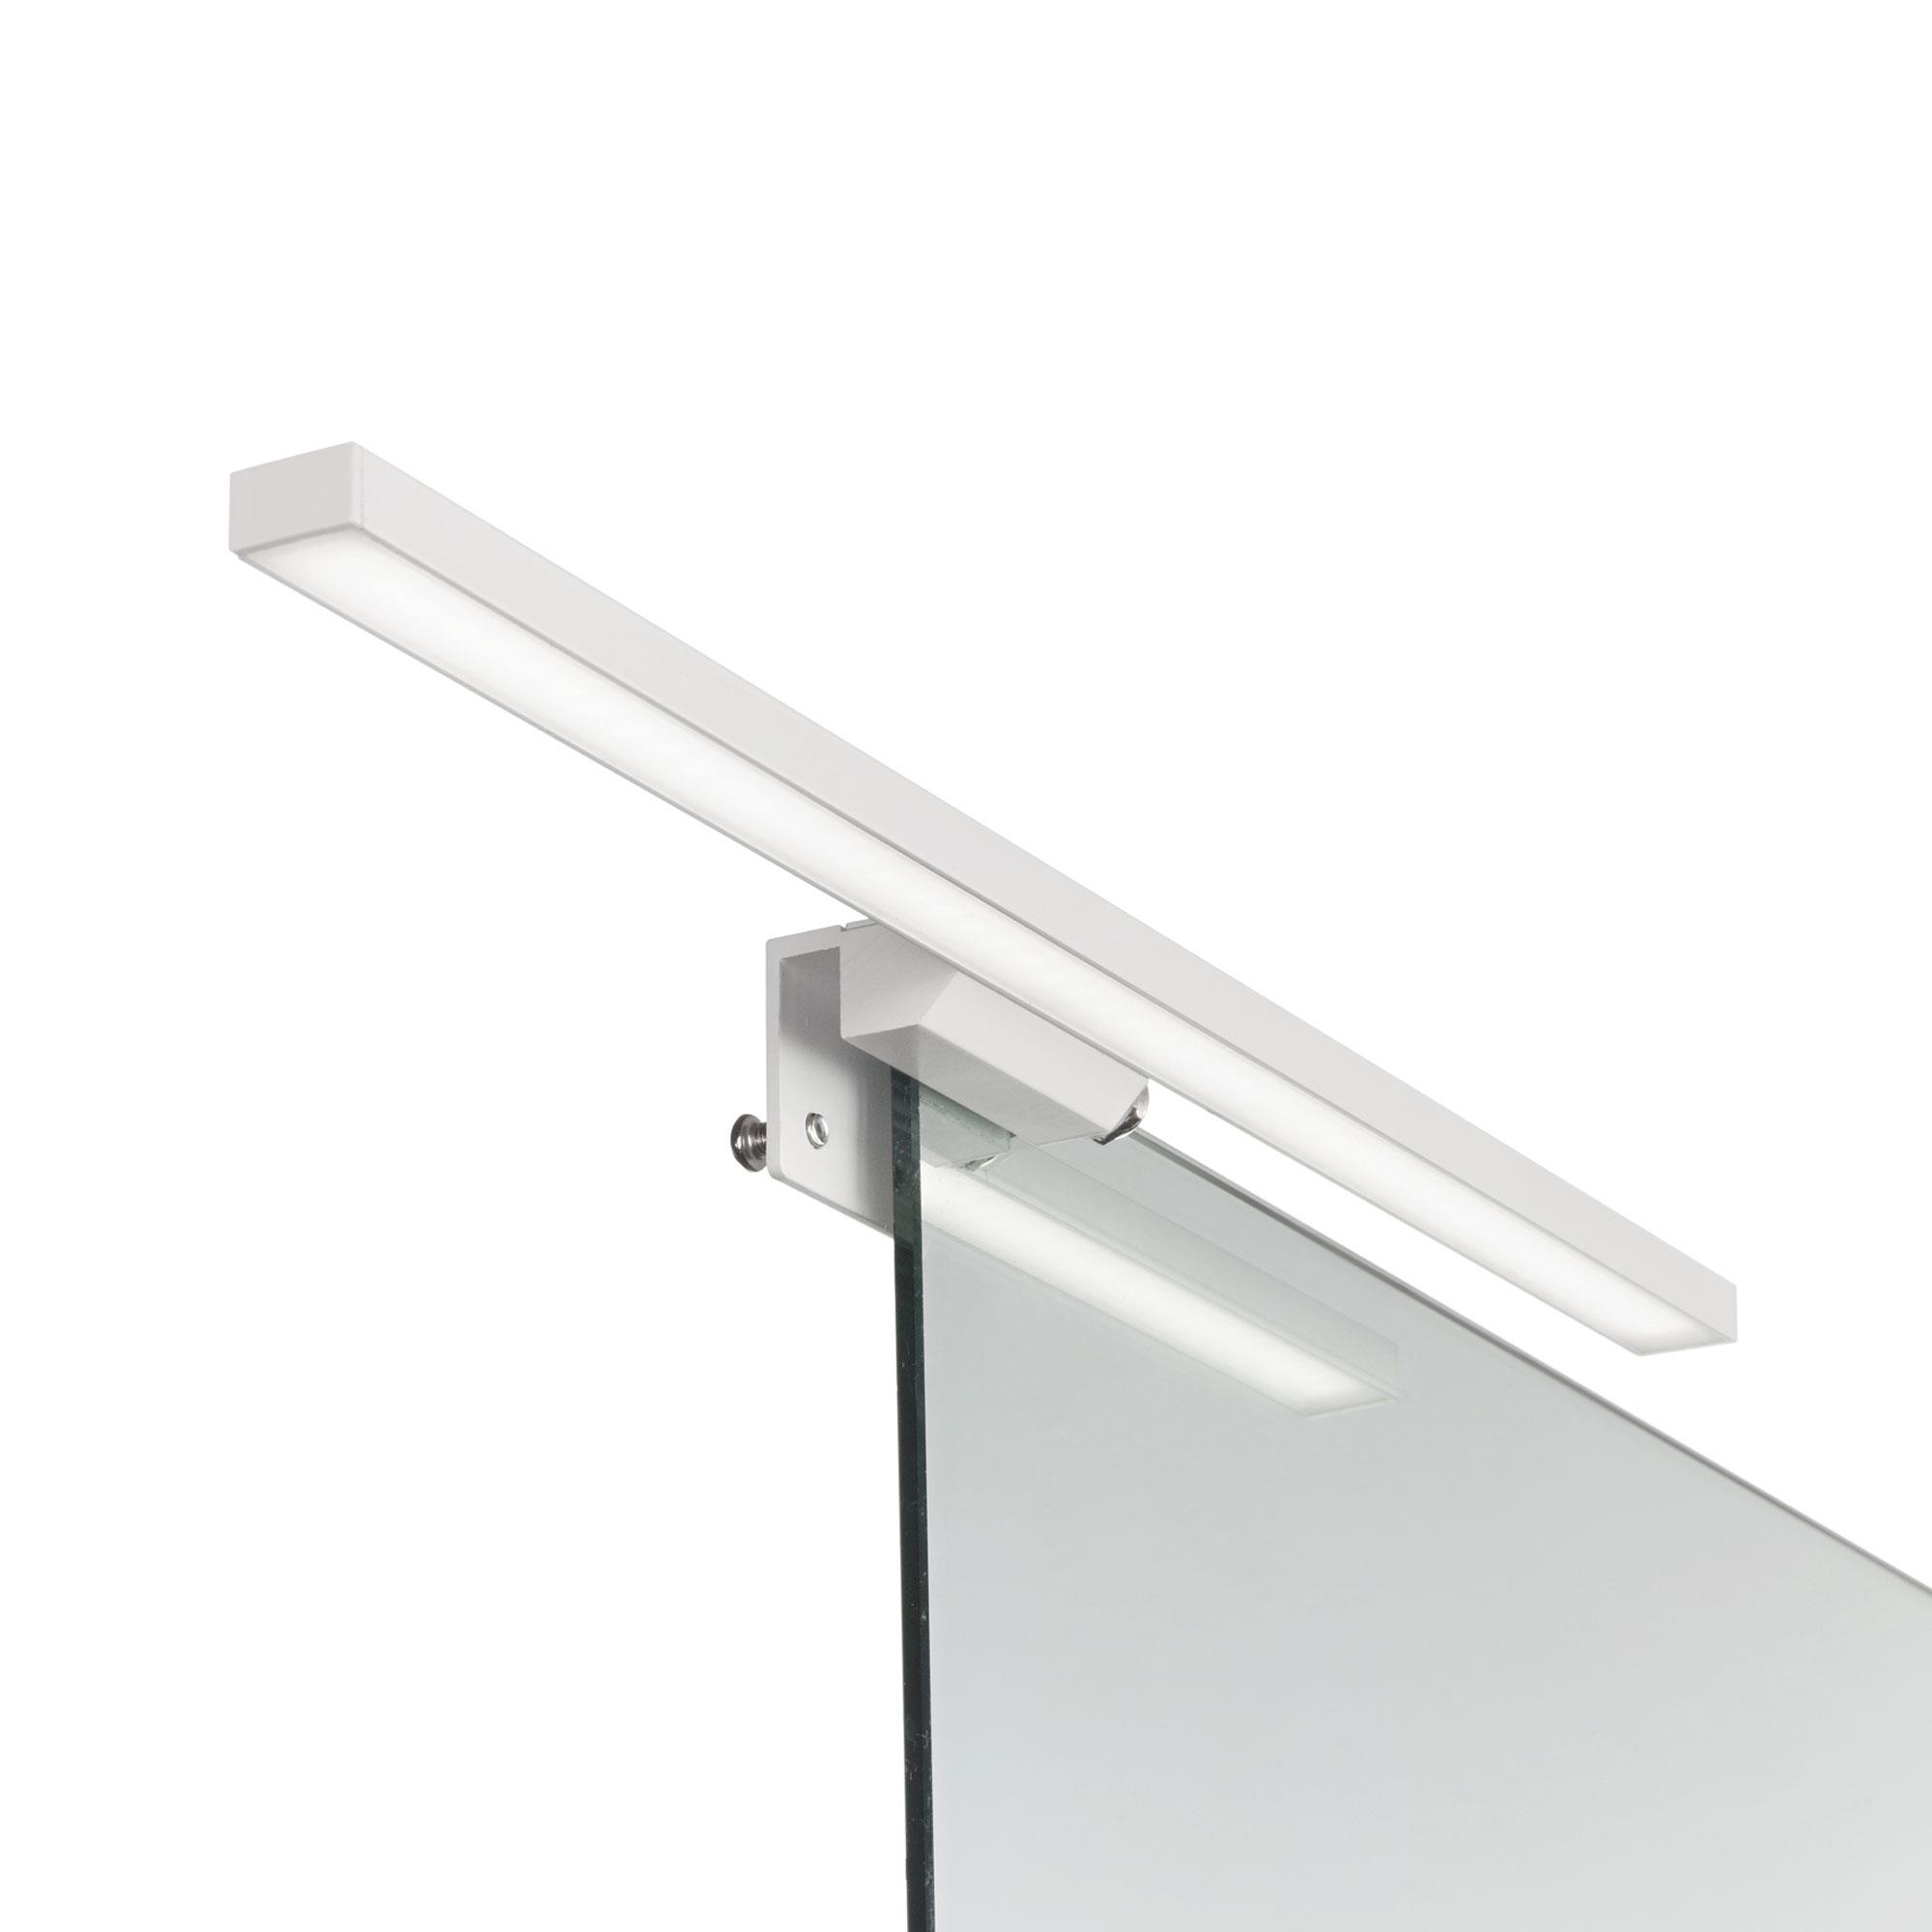 Ideal Lux 136592 EDGAR AP49 BIANCO fürdőszobai tükör falilámpa